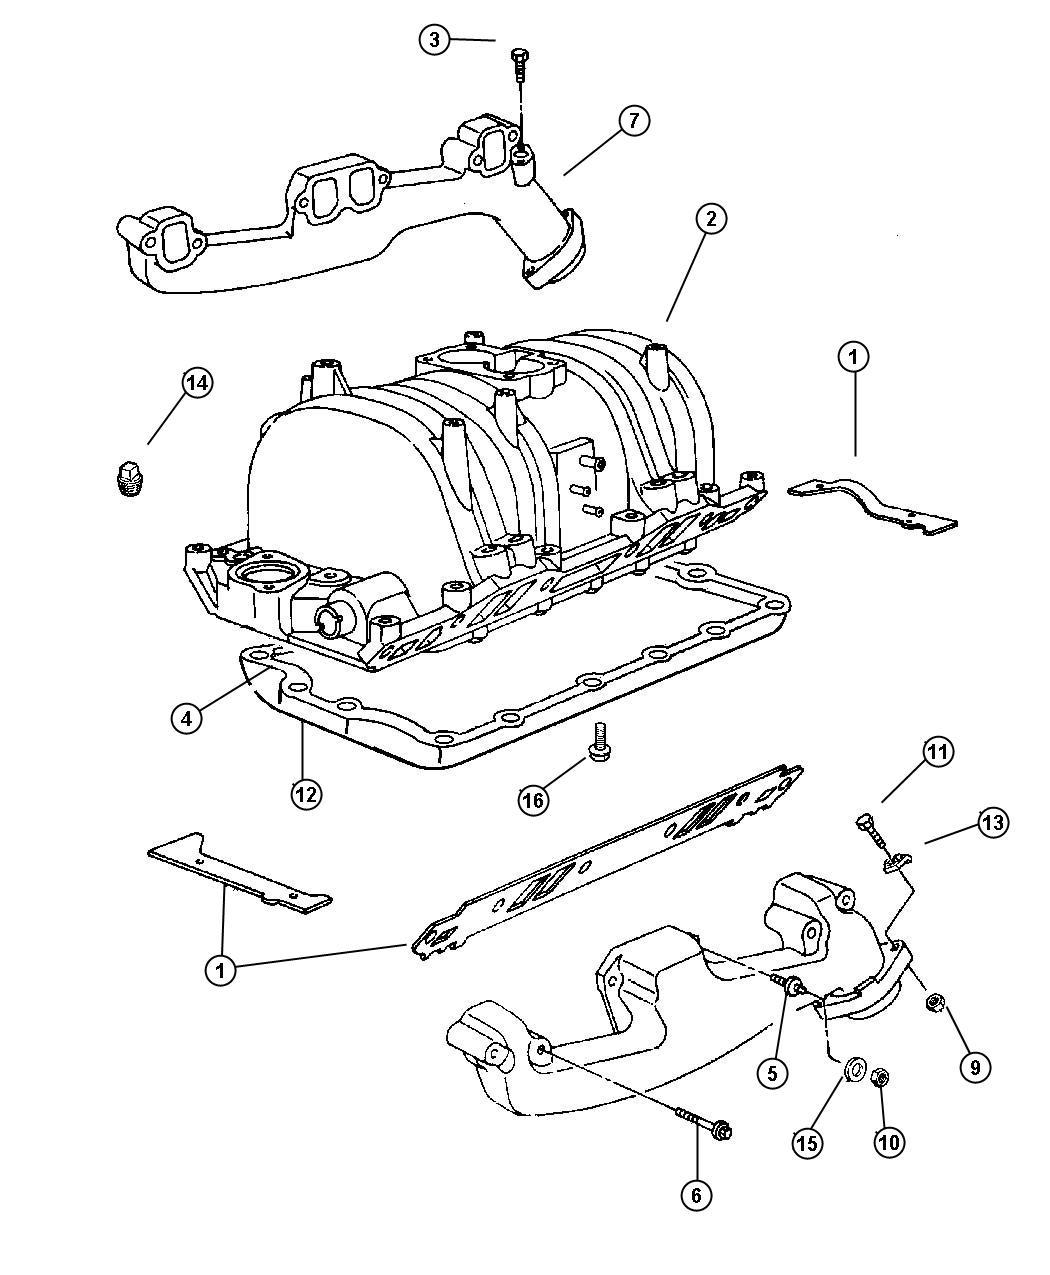 Dodge Durango Stud  312-18   312-24x2 25  Exhaust Manifold  Intake  Engine  Clutch